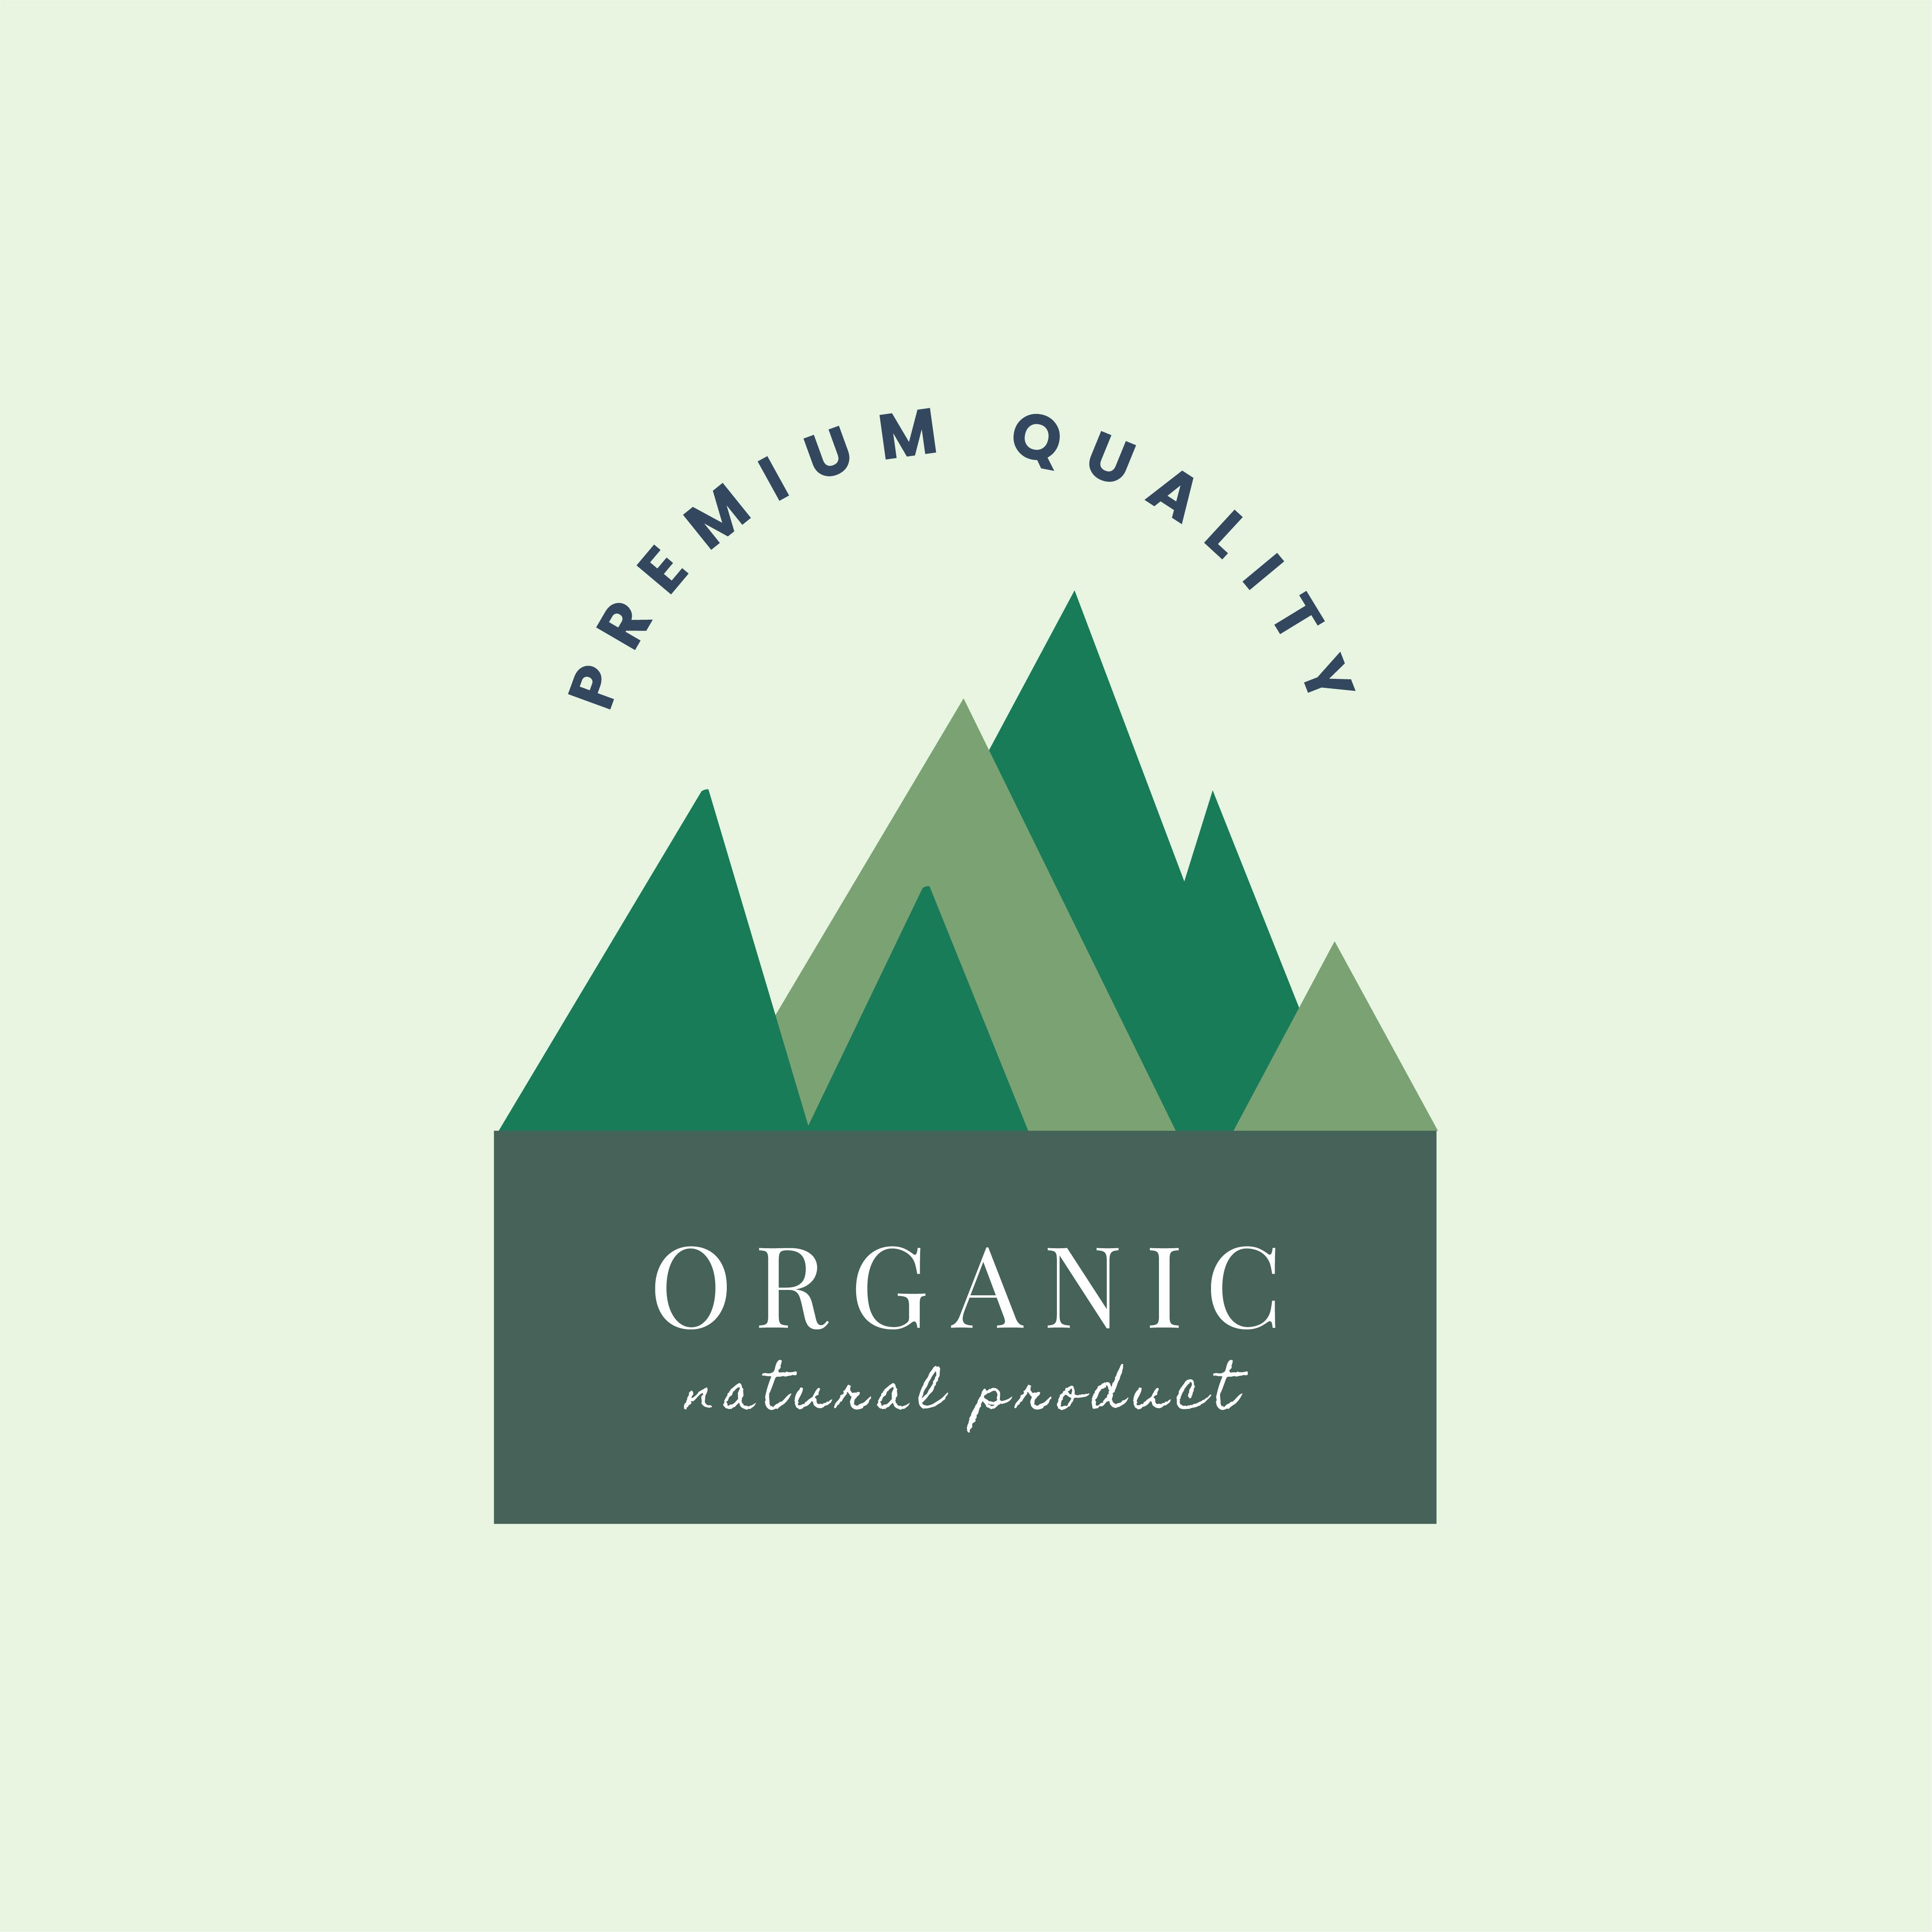 Logo Of Organic Natural Product